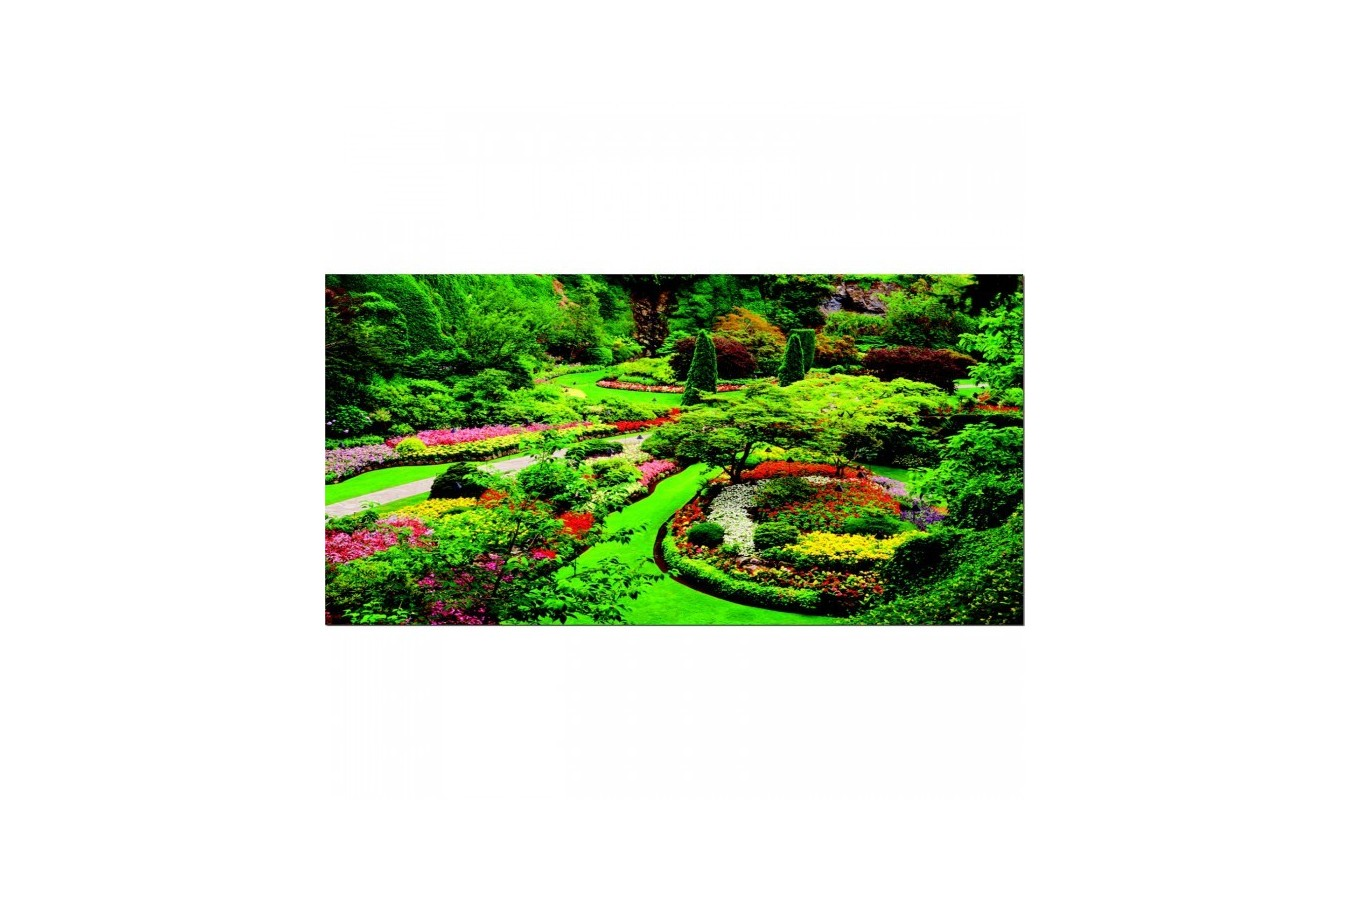 Puzzle Educa - Butchart Gardens, Canada, 1000 piese (15523)